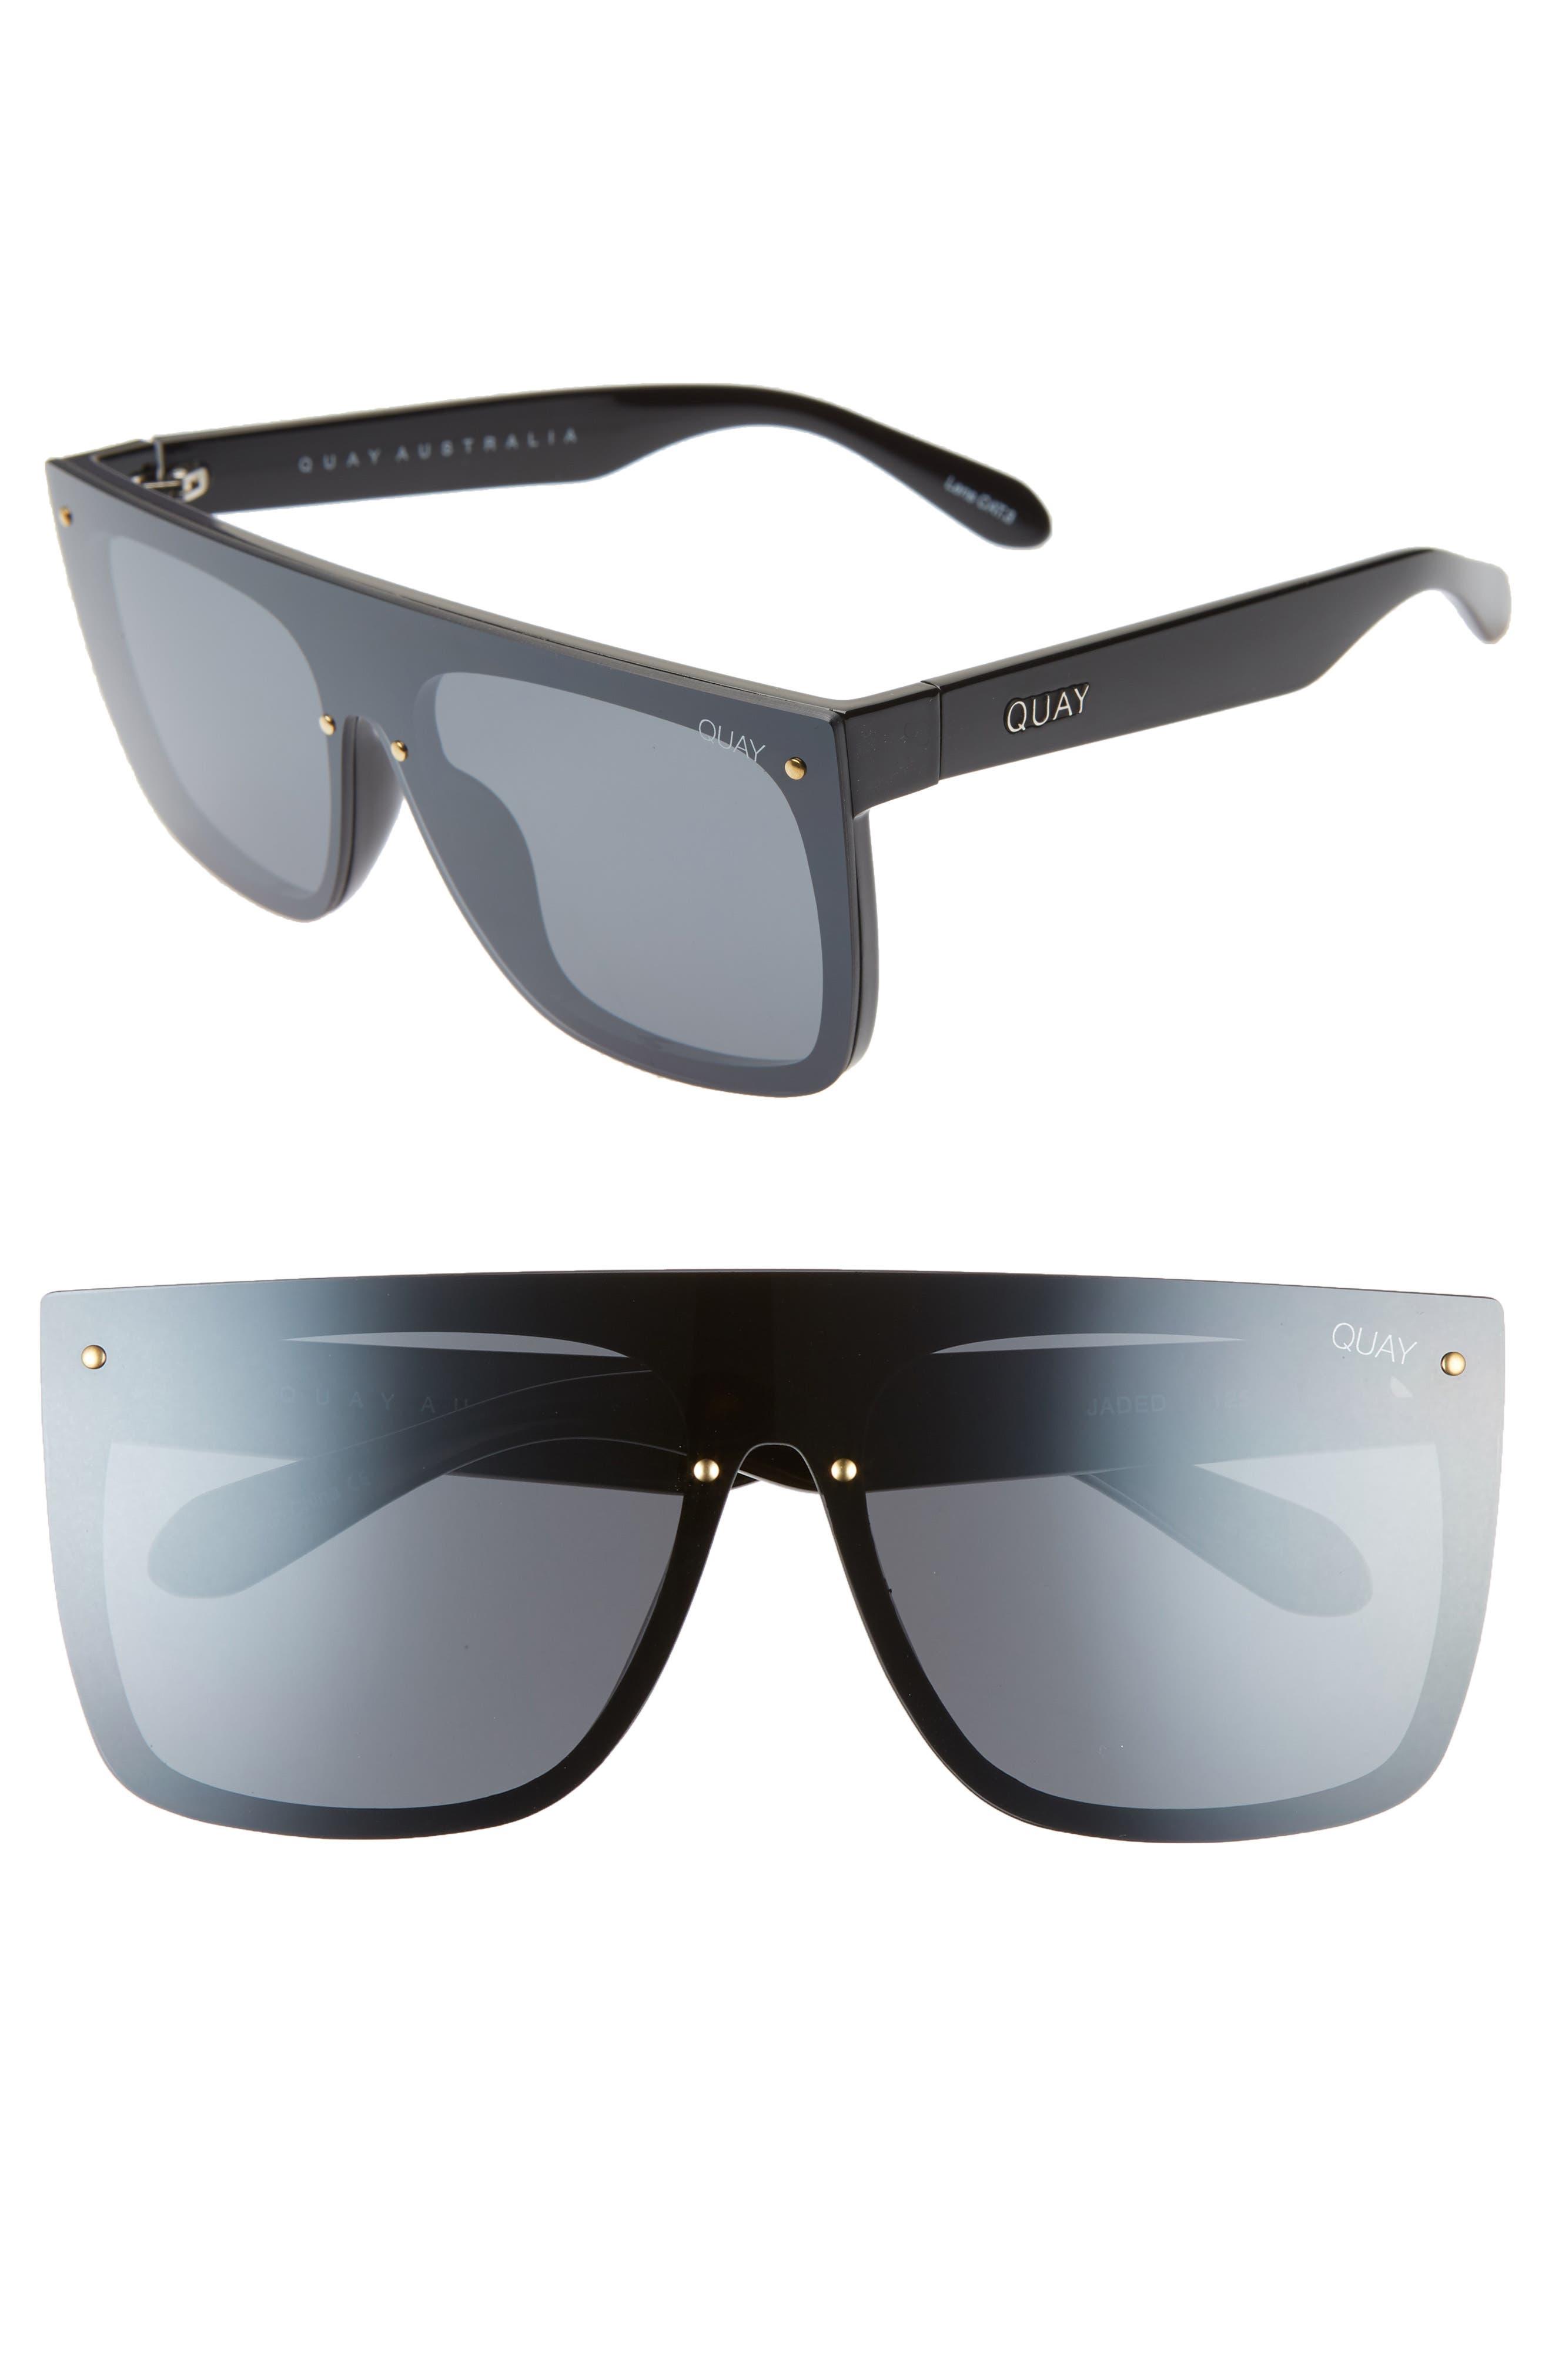 Quay Australia Jaded 150Mm Flat Top Sunglasses - Black/ Smoke Flash